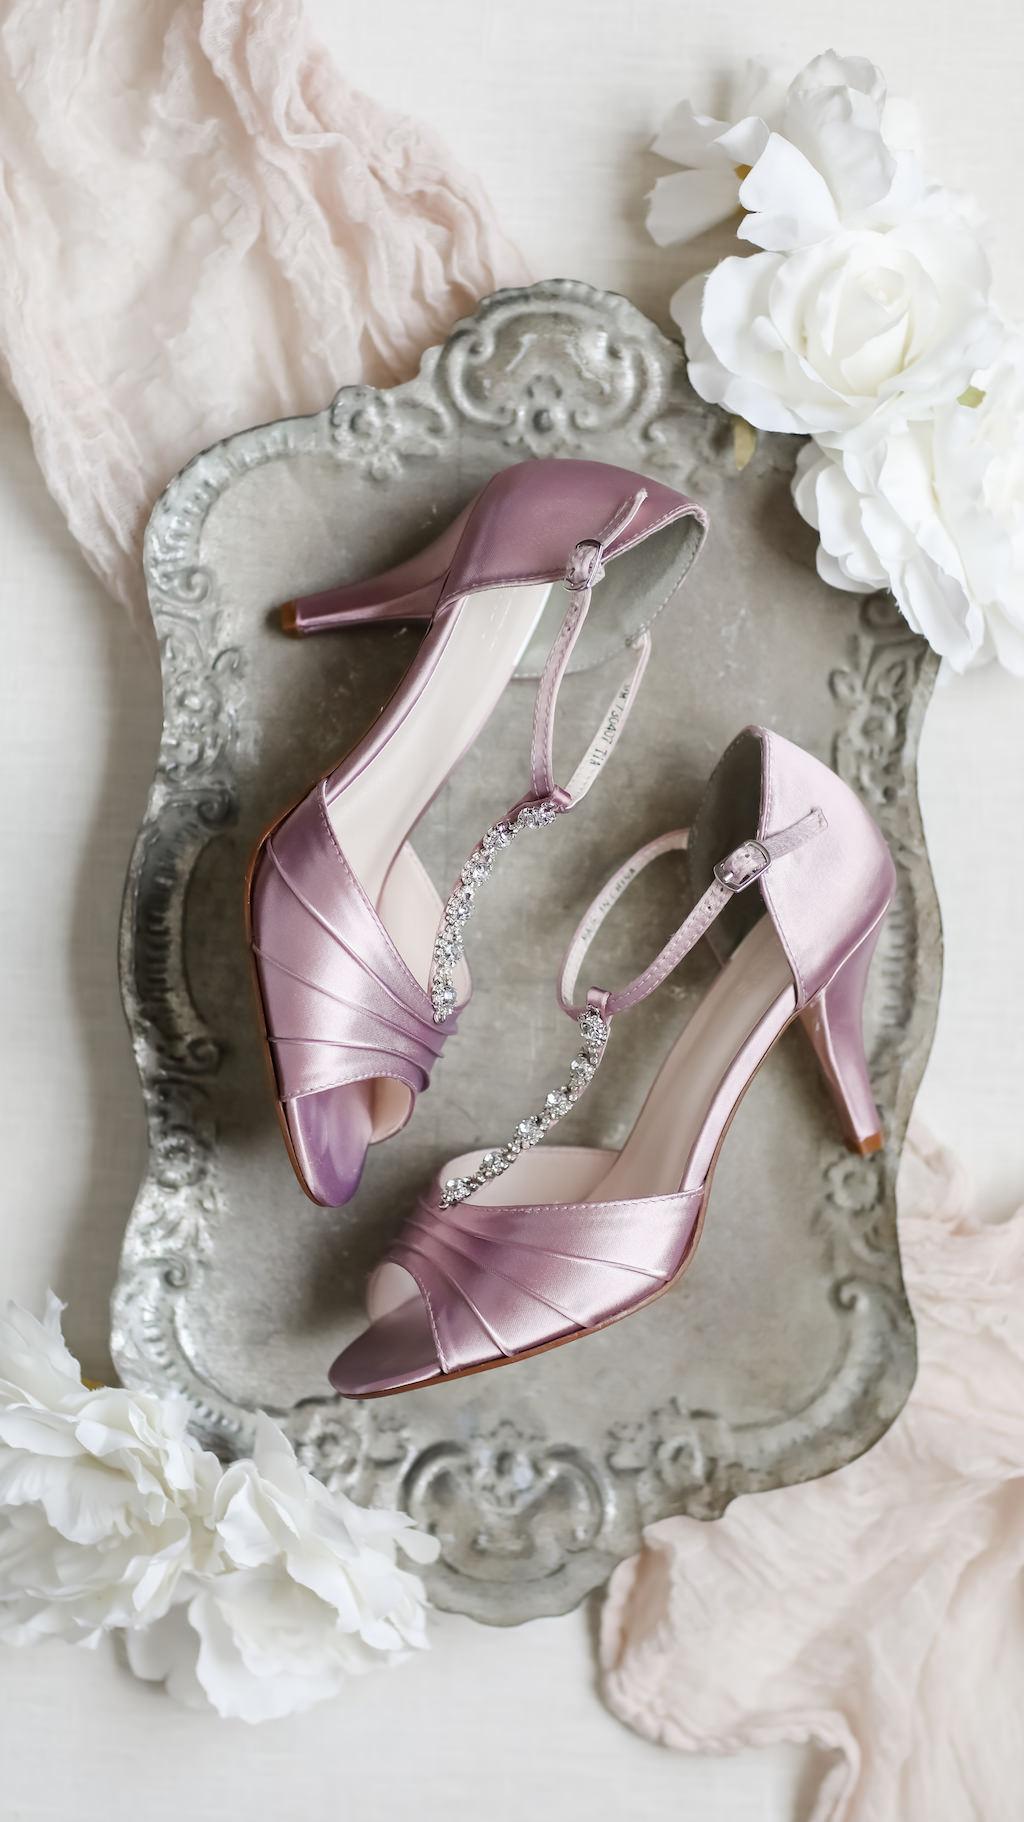 Lilac Silk Peep Toe with Rhinestone Strap Bridal Wedding Shoes | Tampa Wedding Photographer Lifelong Photography Studio